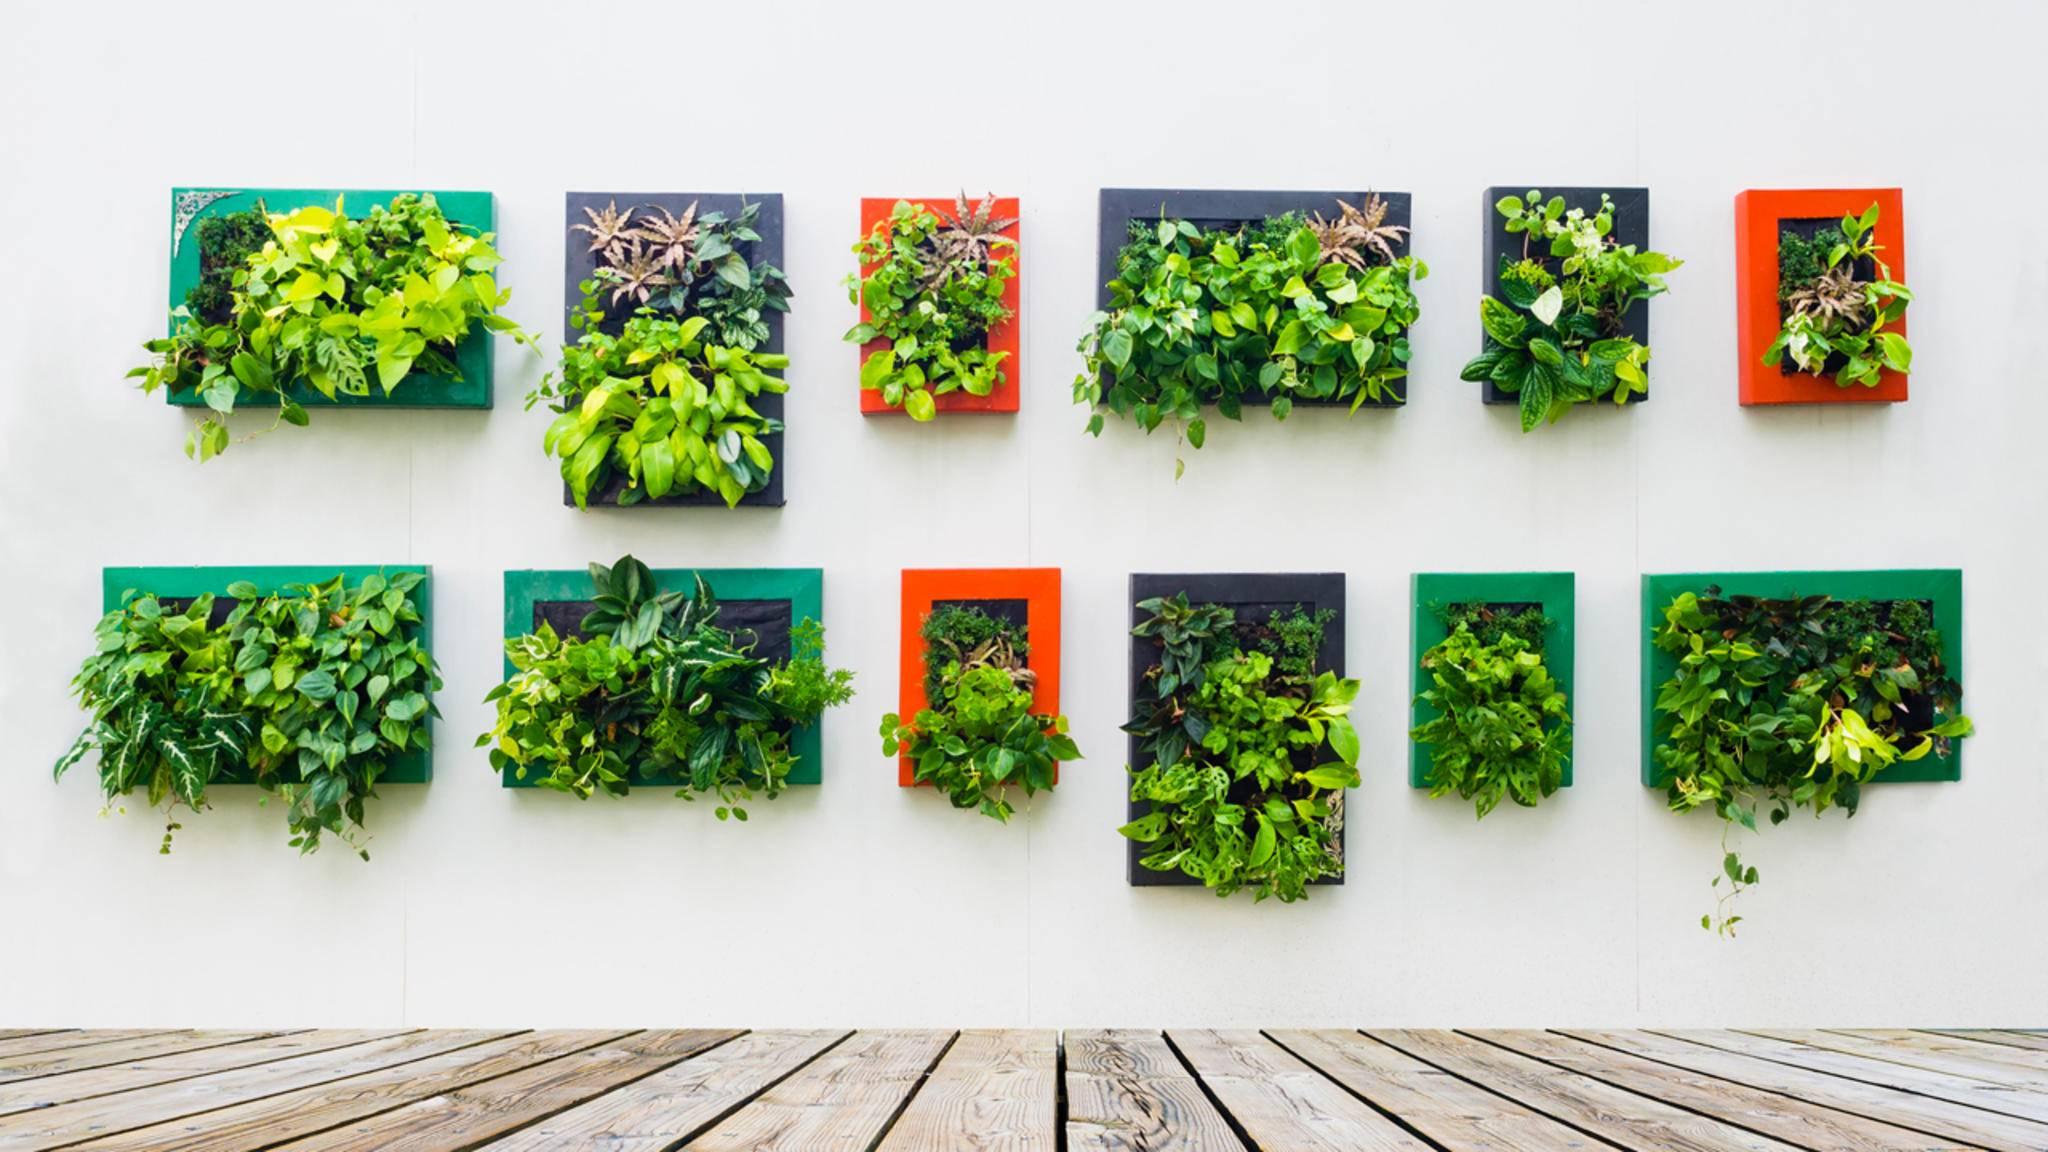 Vertikaler Garten: 5 Tipps und Ideen fürs Beet an der Wand